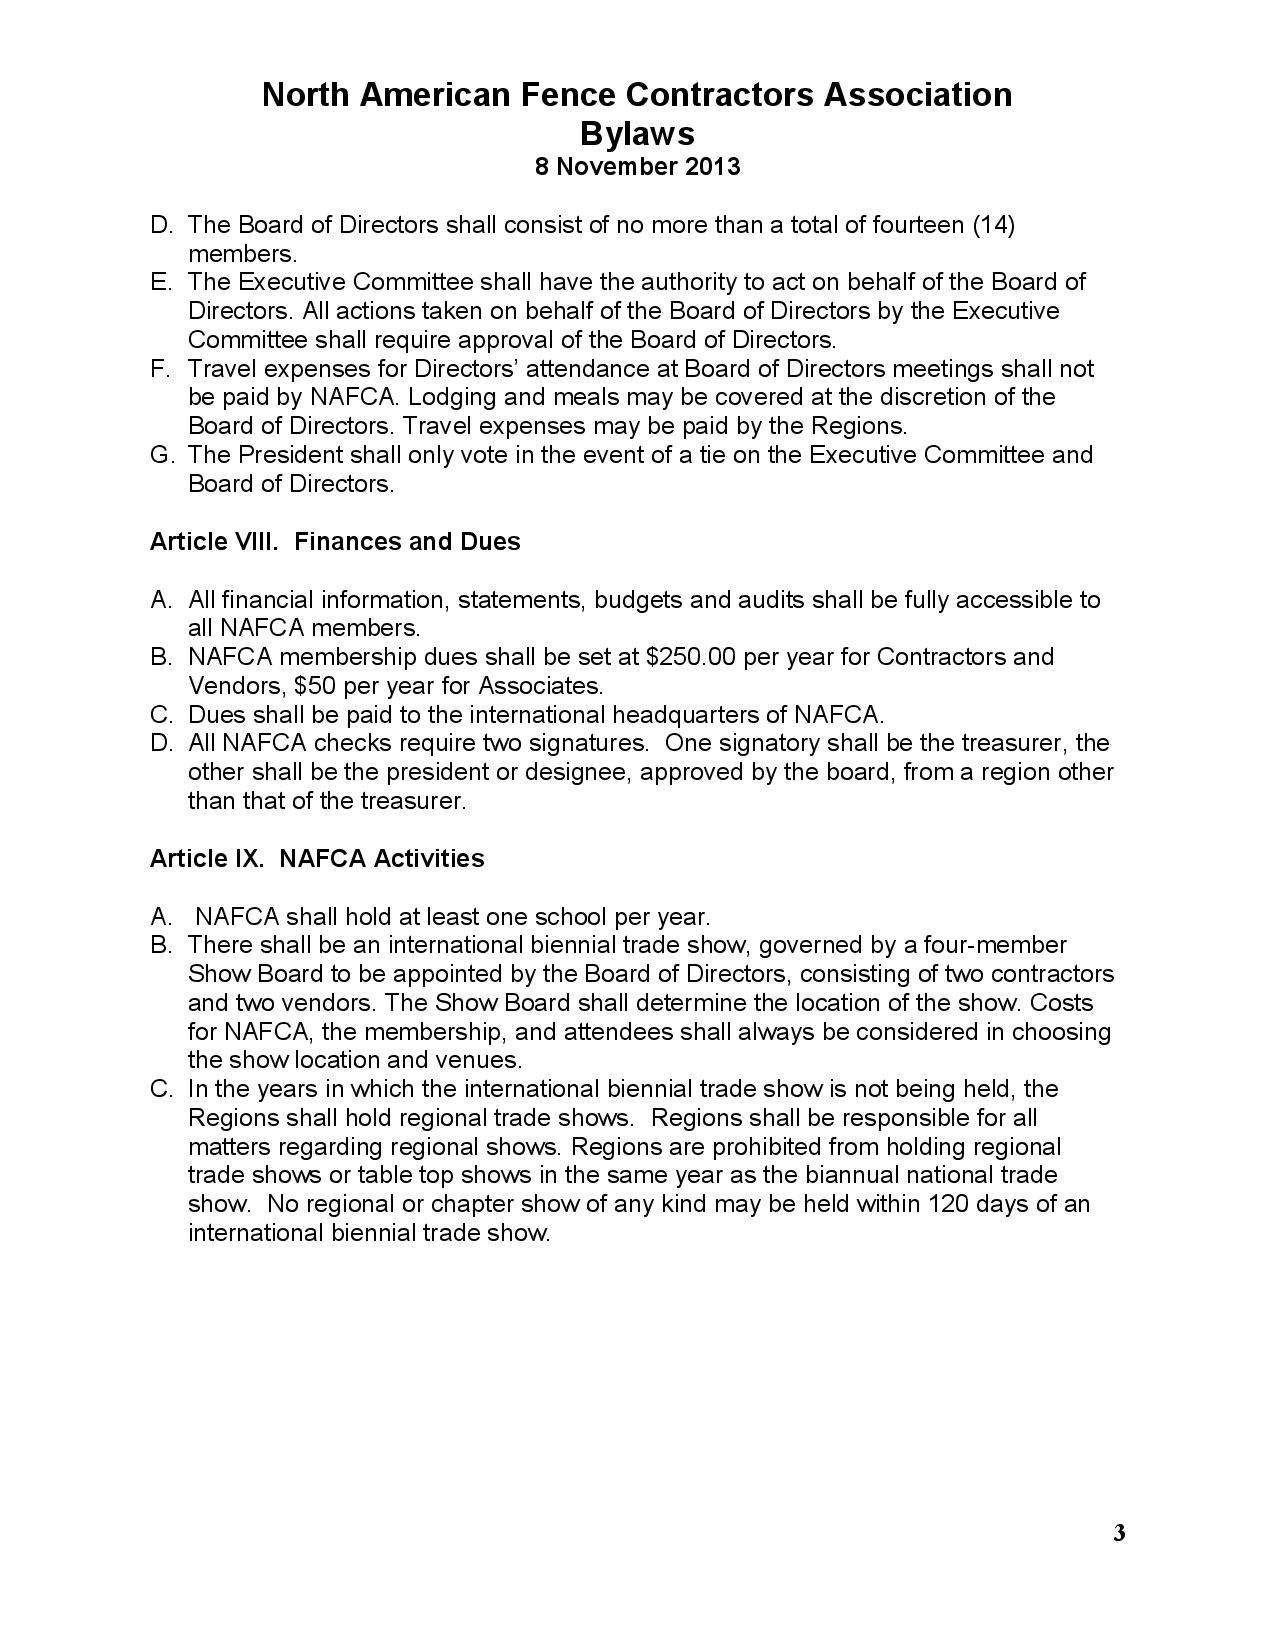 Bylaws 8 Nov 2013-page-003